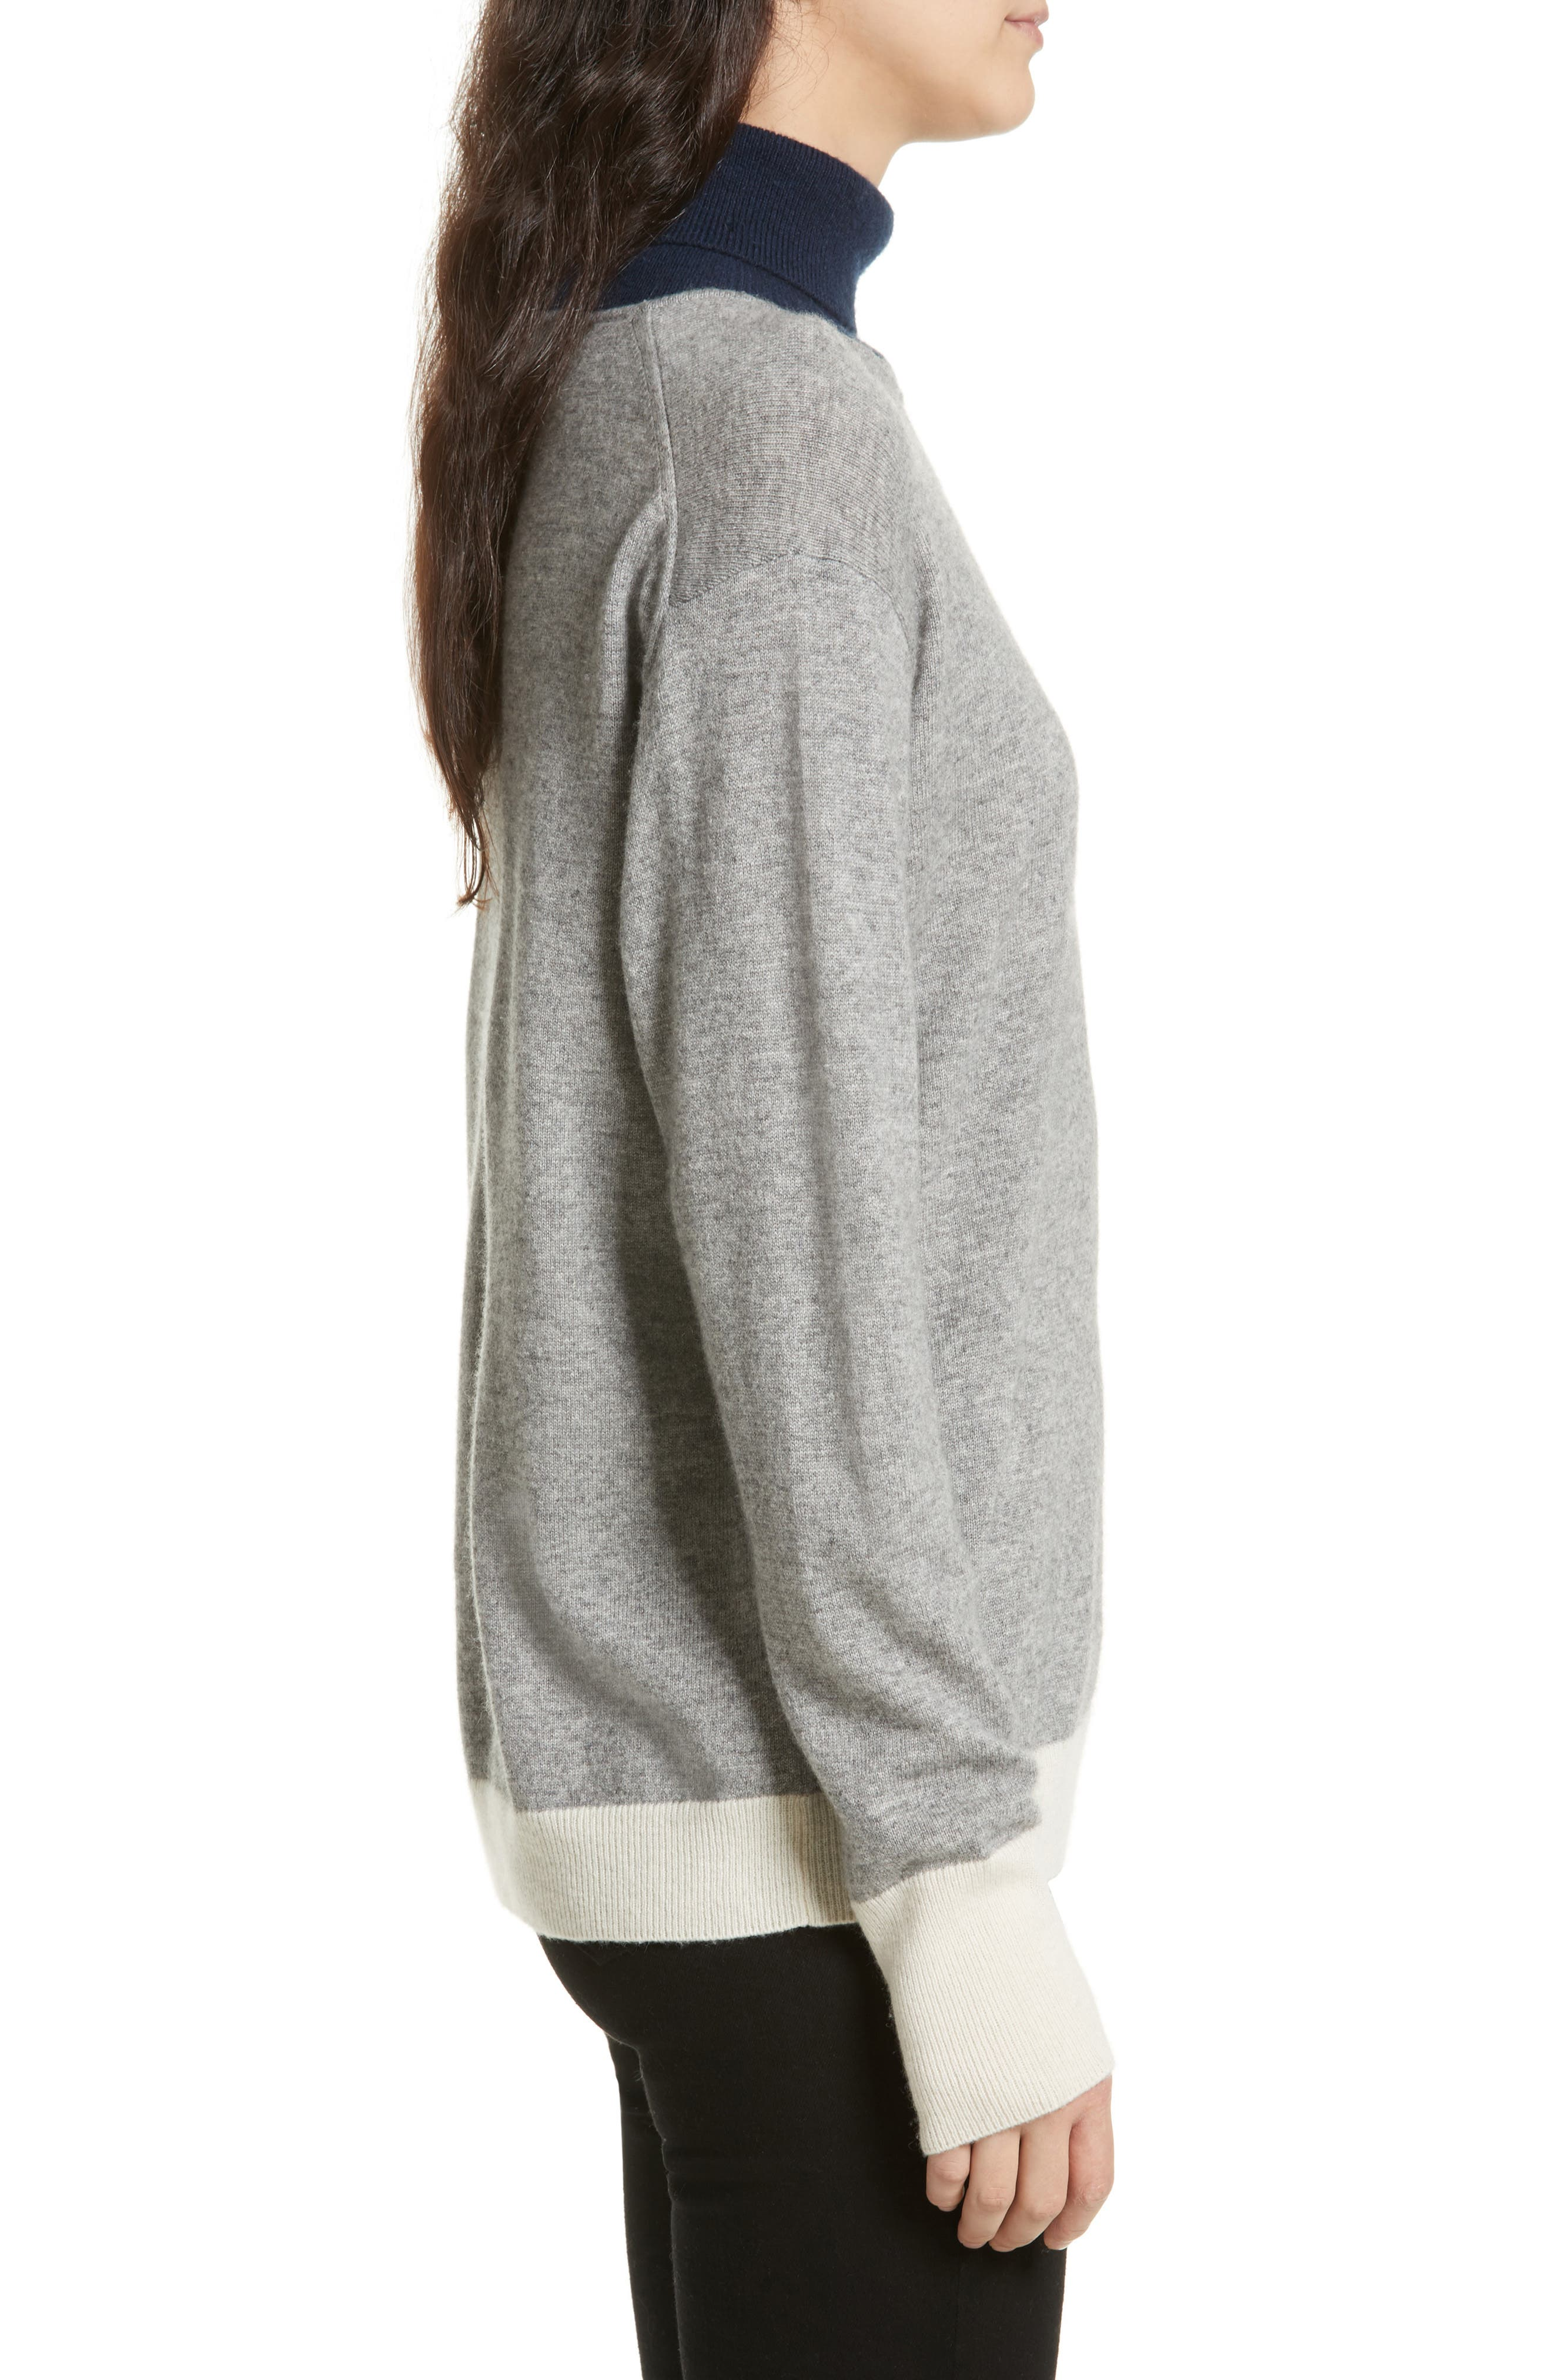 Rhea Wool & Cashmere Turtleneck Sweater,                             Alternate thumbnail 3, color,                             Grey Heather